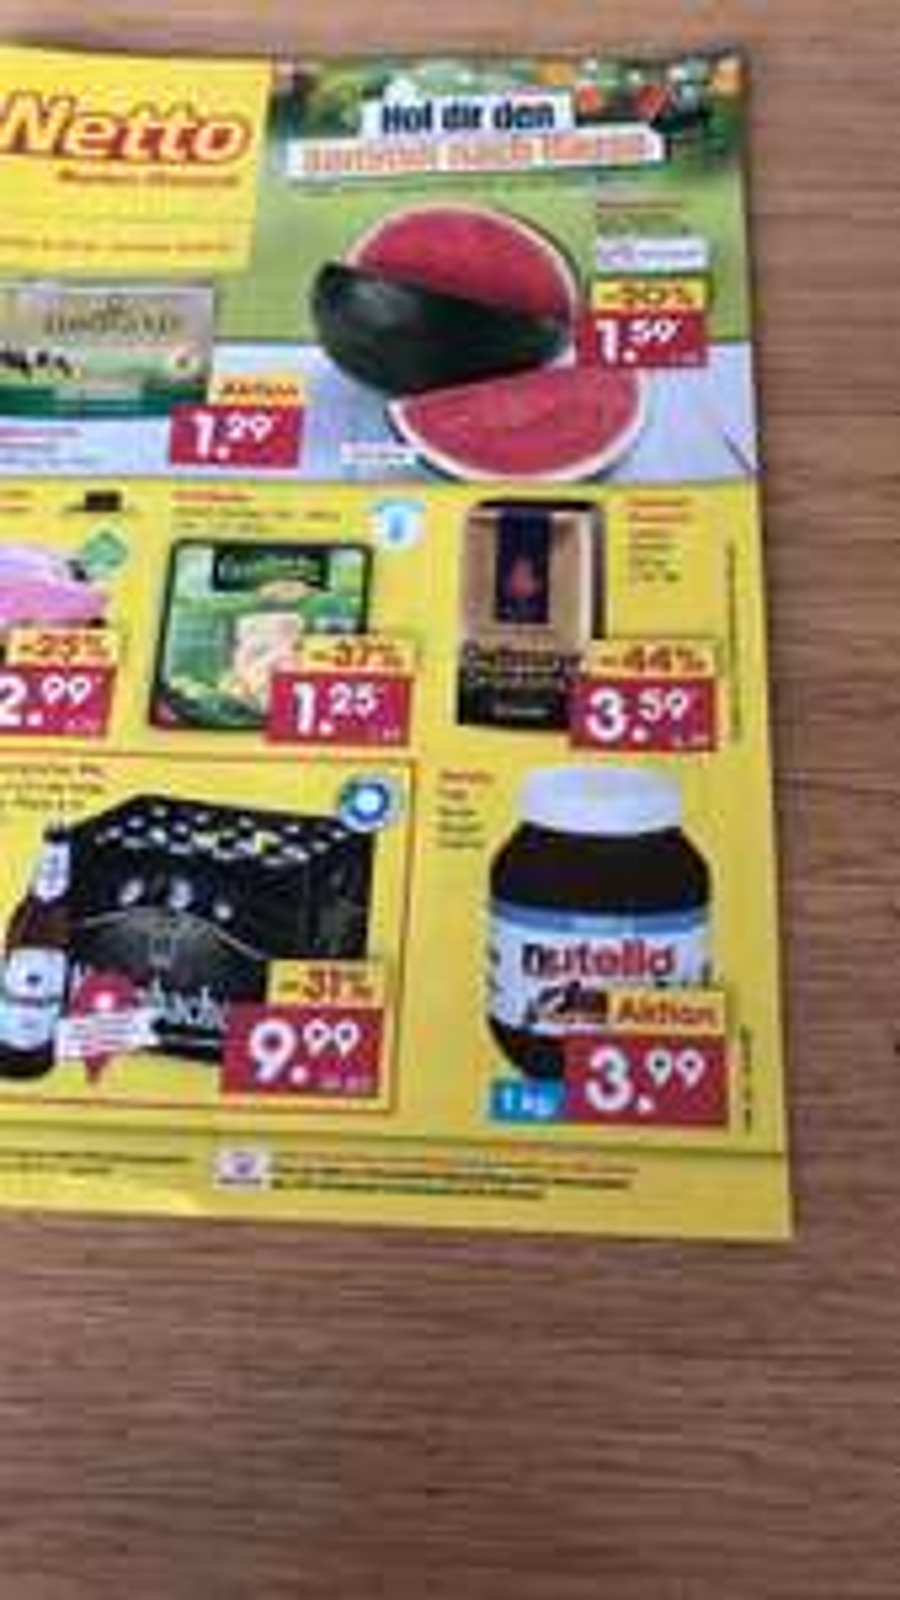 [Grensdeal] Nutella €3.99 /kg